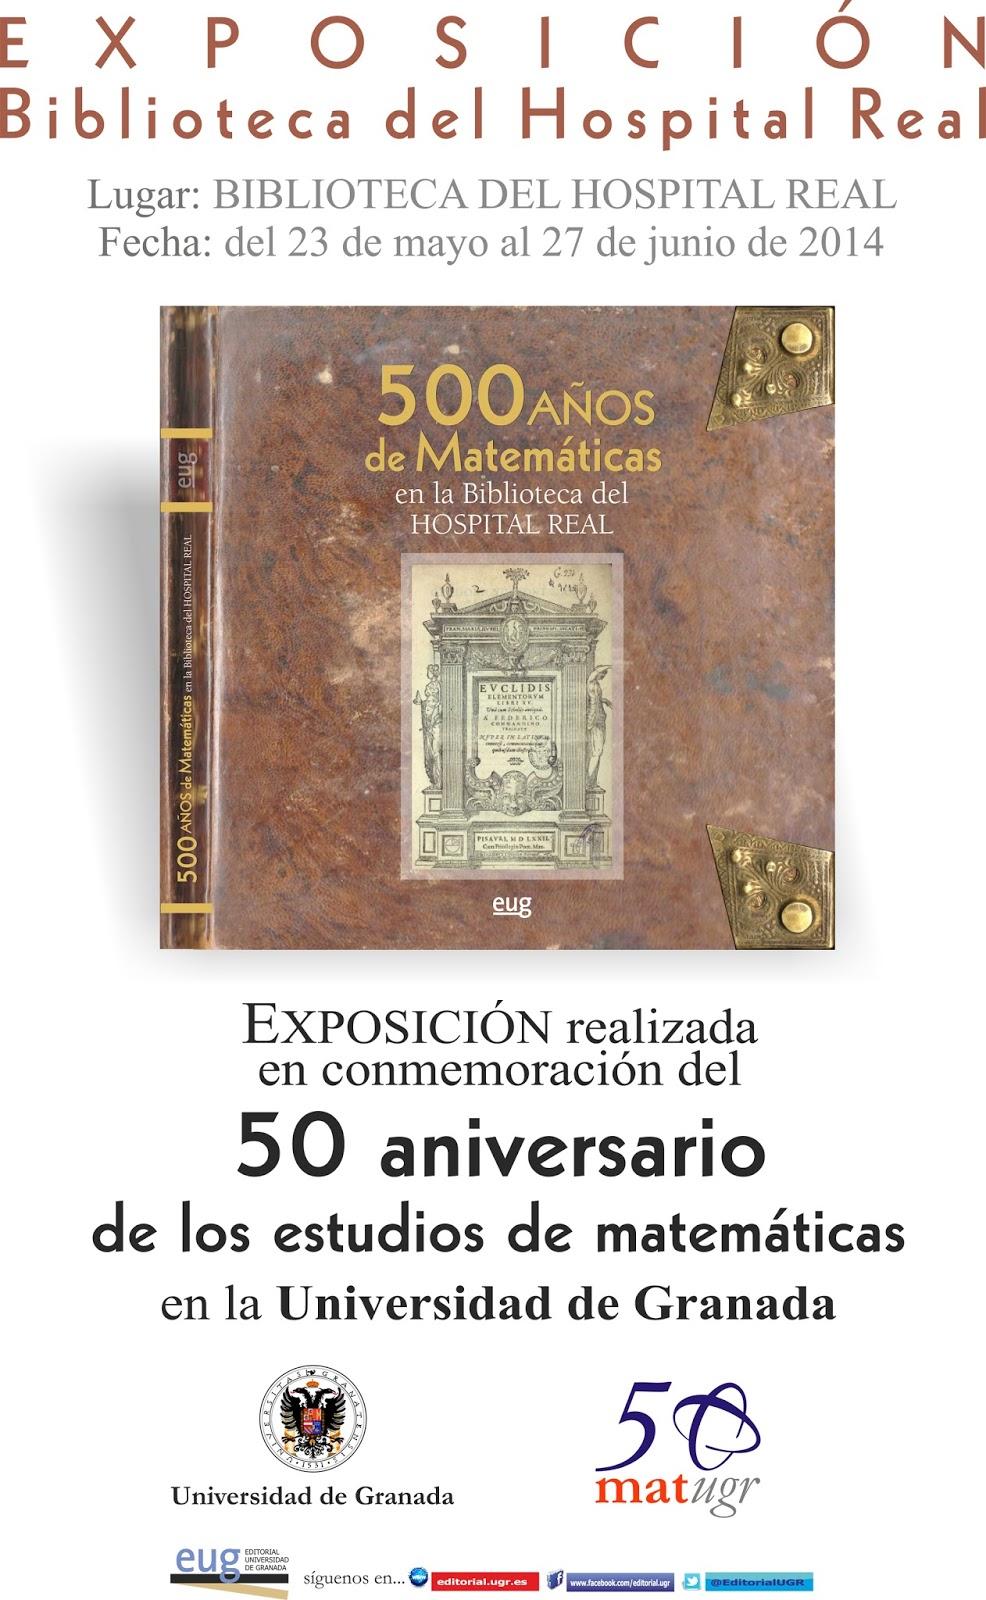 http://biblioteca.ugr.es/pages/biblioteca_ugr/eventos-bug/exposiciones/estudios-de-matematicas